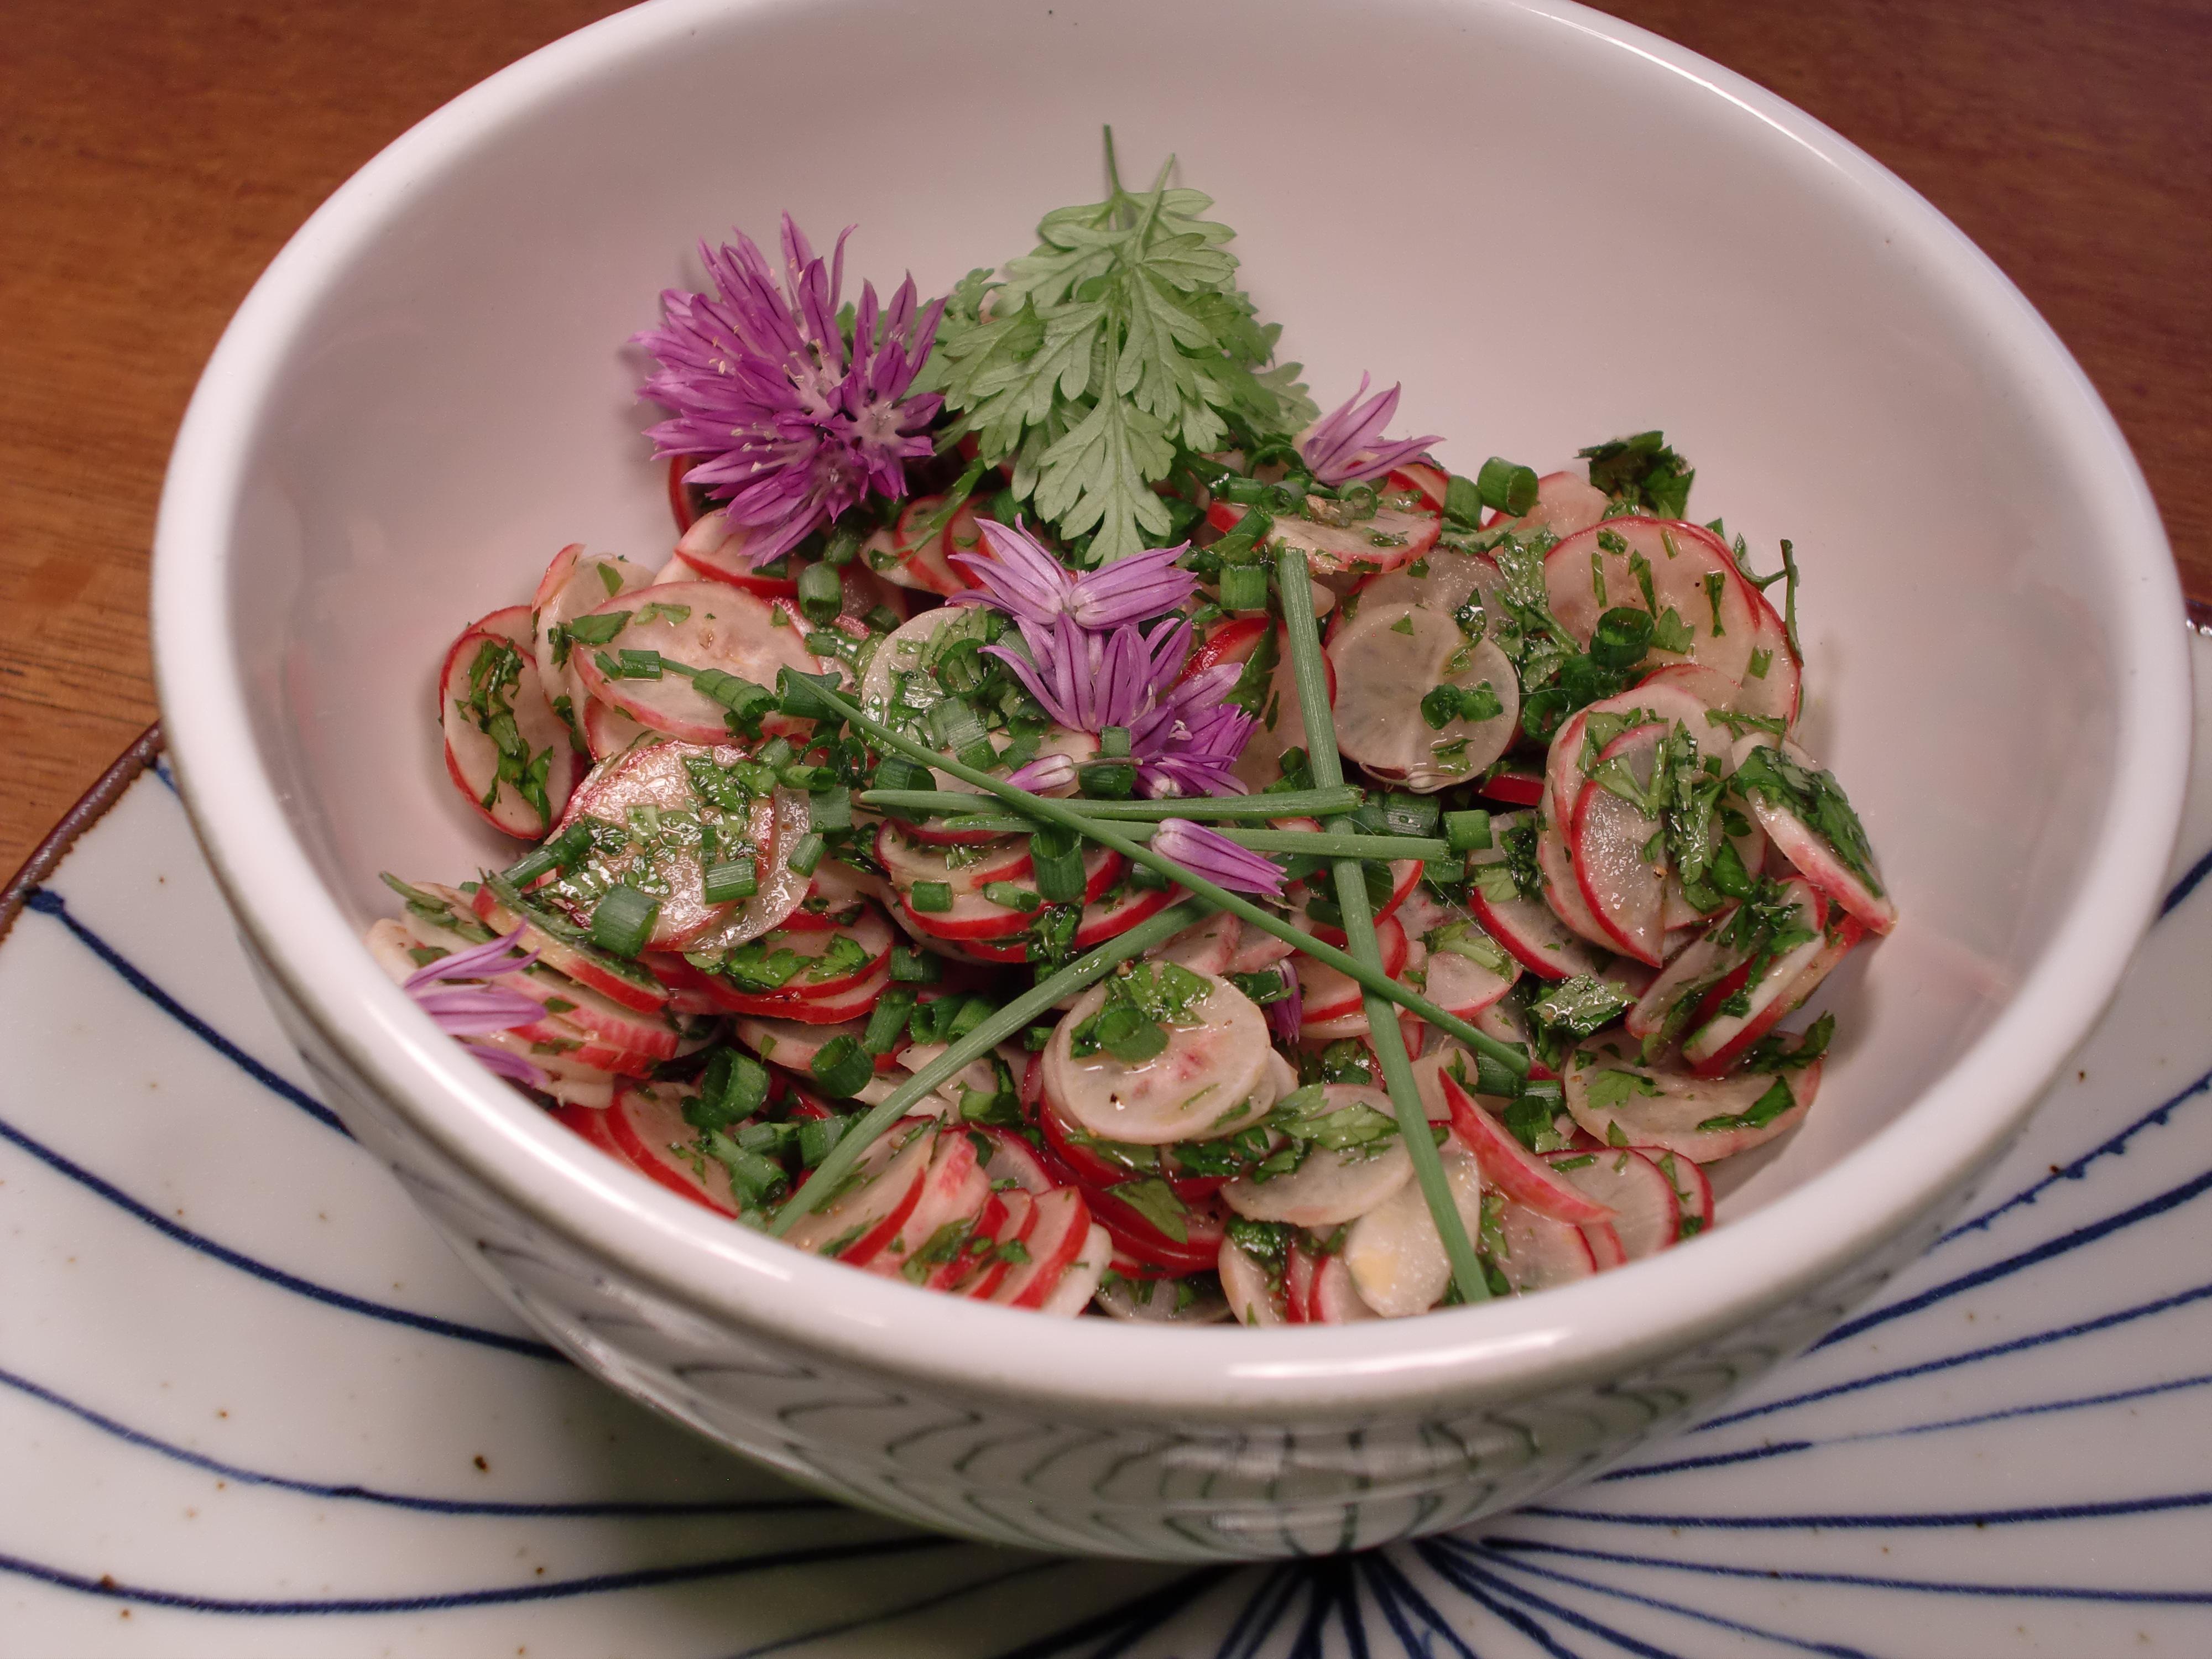 Spring Radish Salad with Chervil and Pepitas